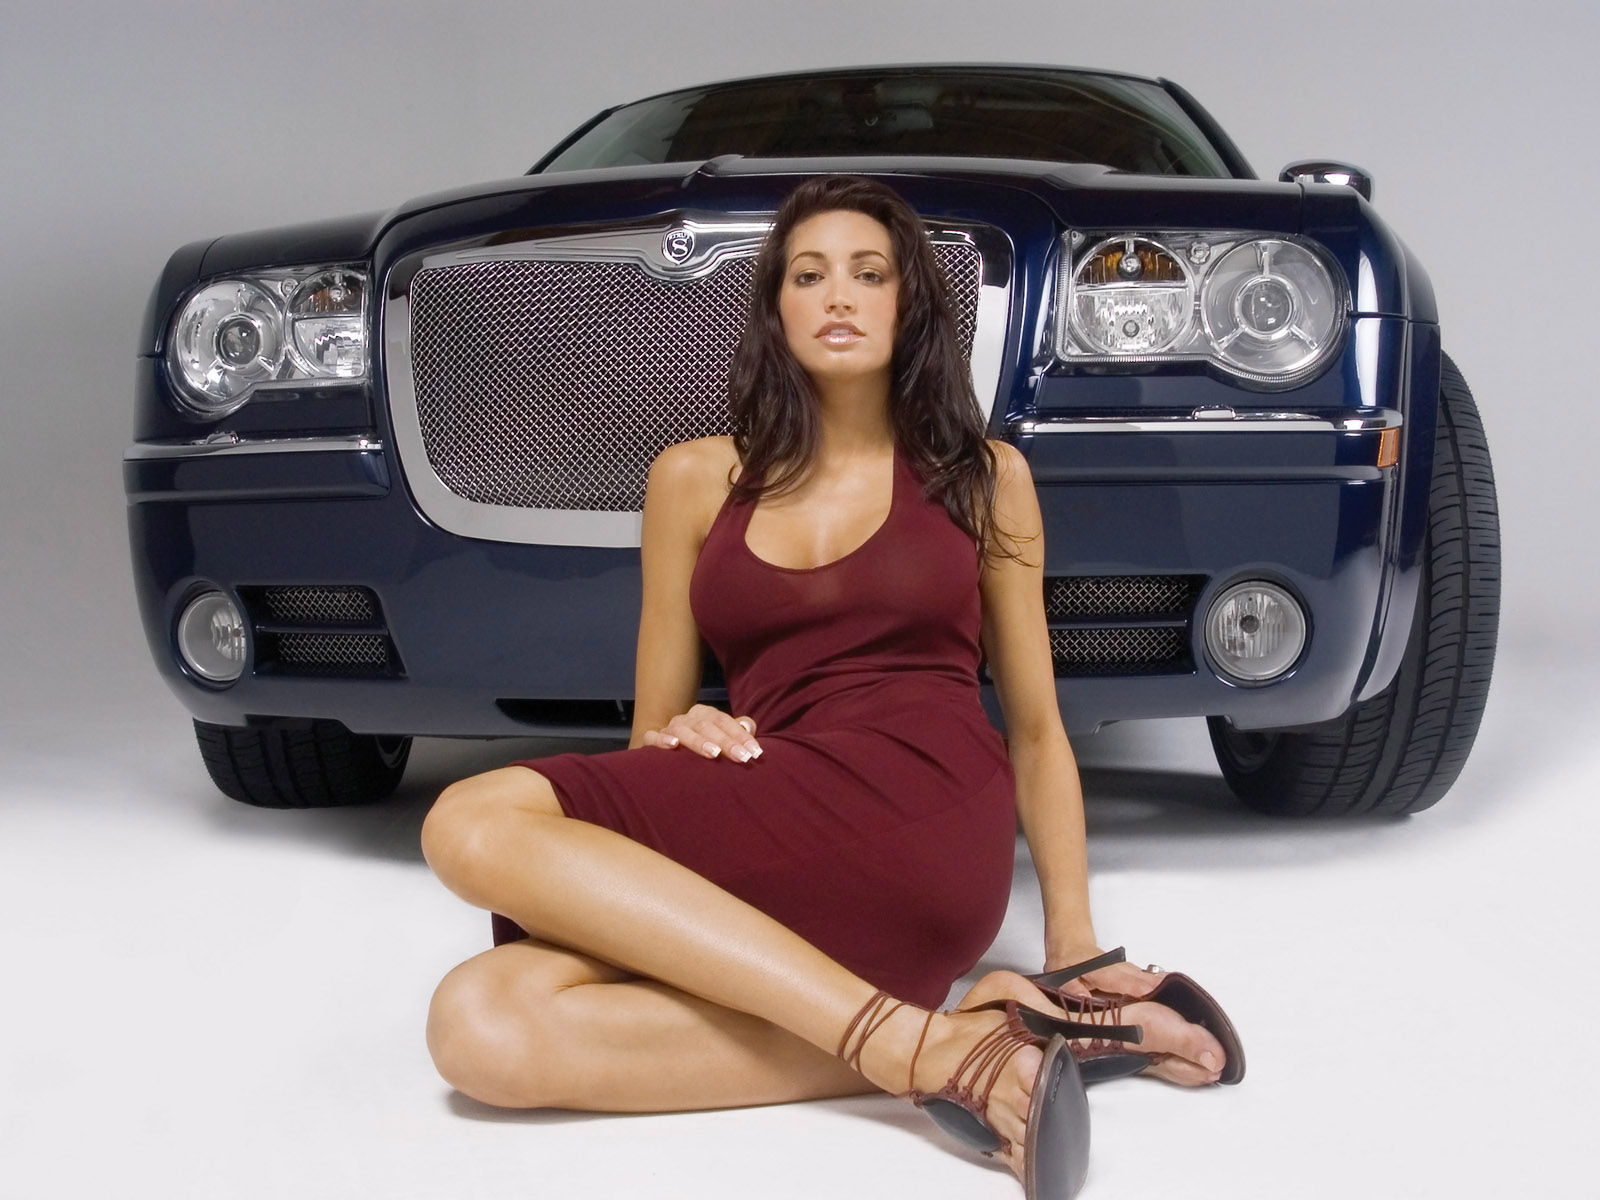 2008 Strut Chrysler 300c - Detroit Collection